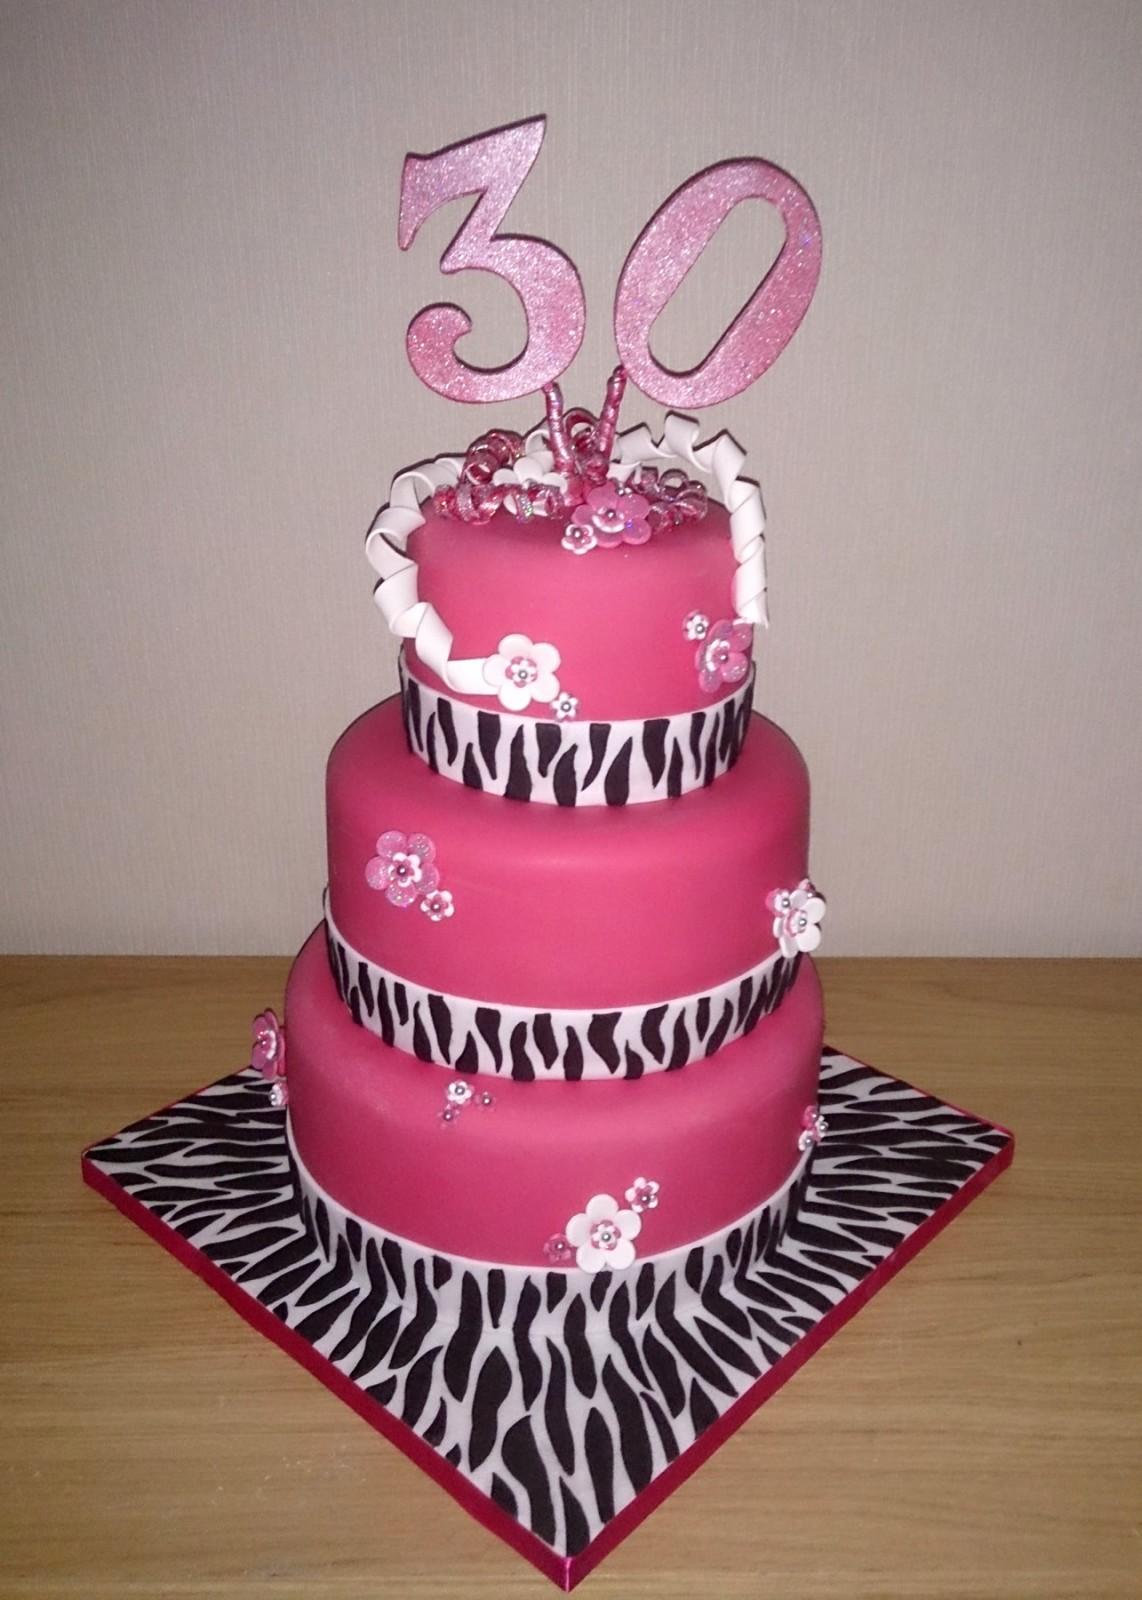 Astounding 3 Tier Zebra Print 30Th Birthday Cake Susies Cakes Funny Birthday Cards Online Alyptdamsfinfo